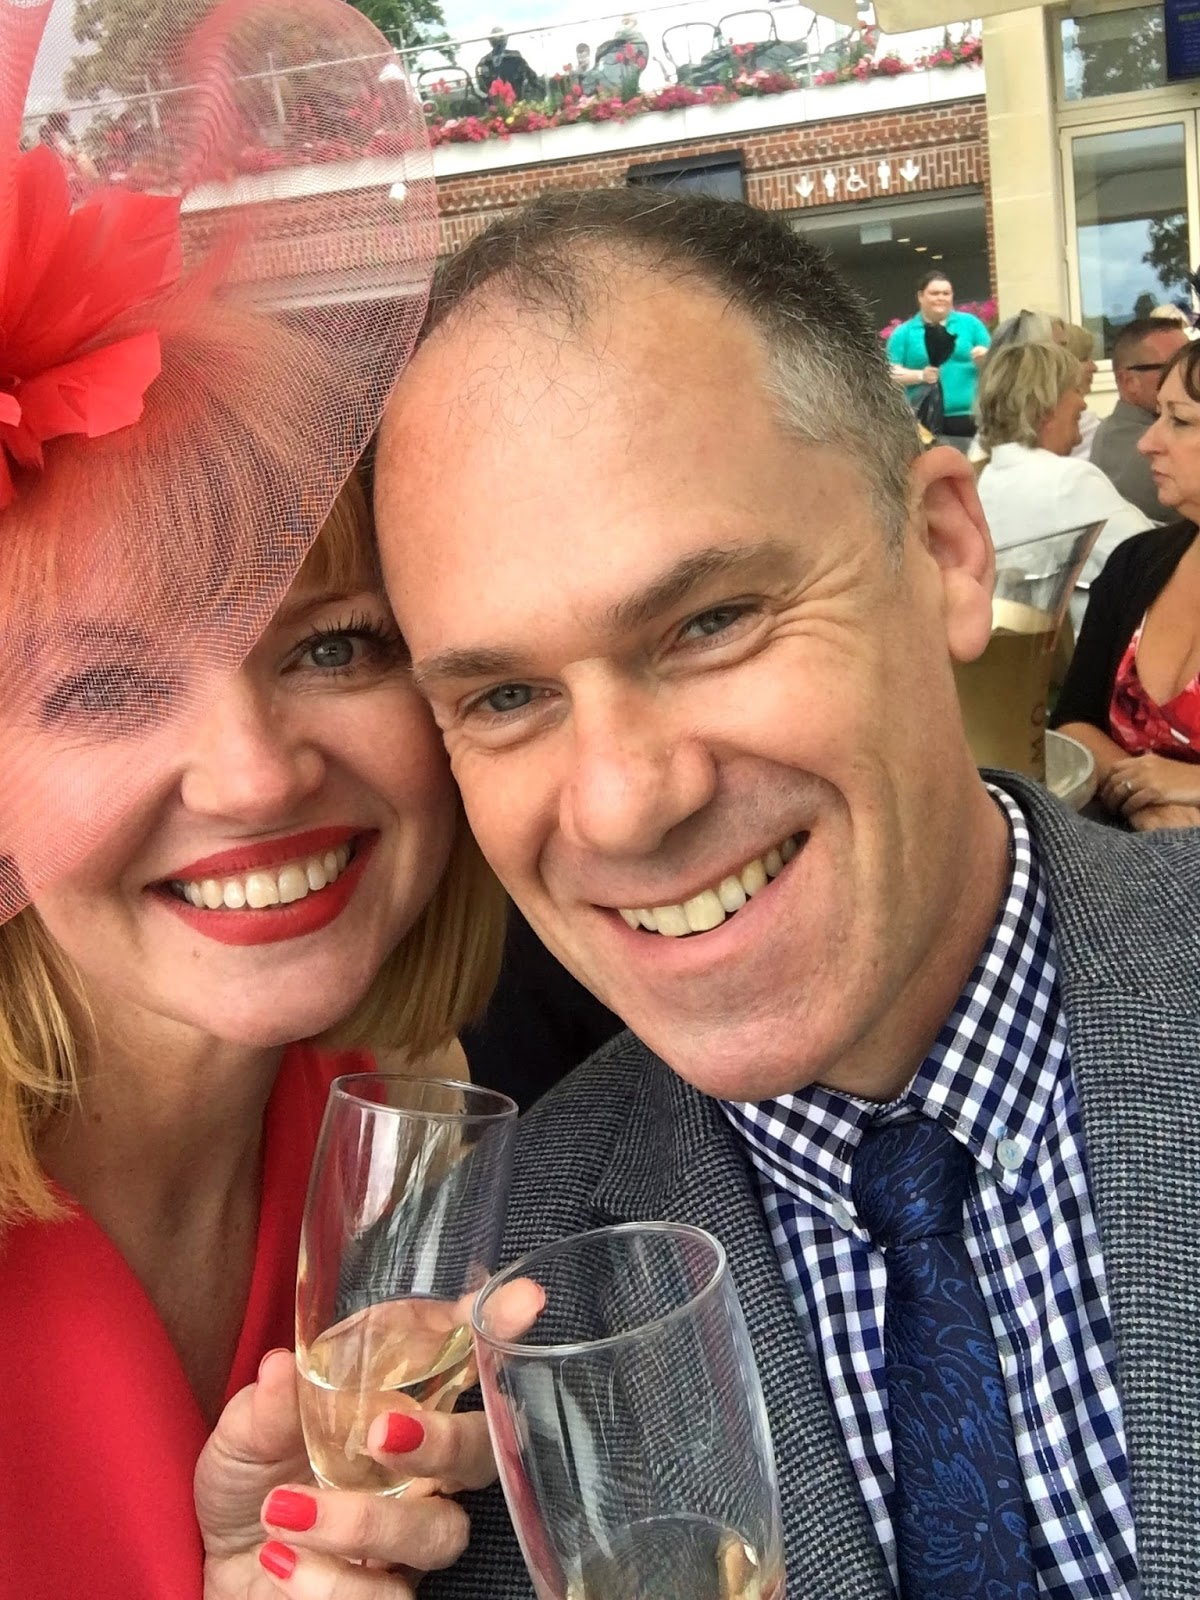 York Races, champagne selfie